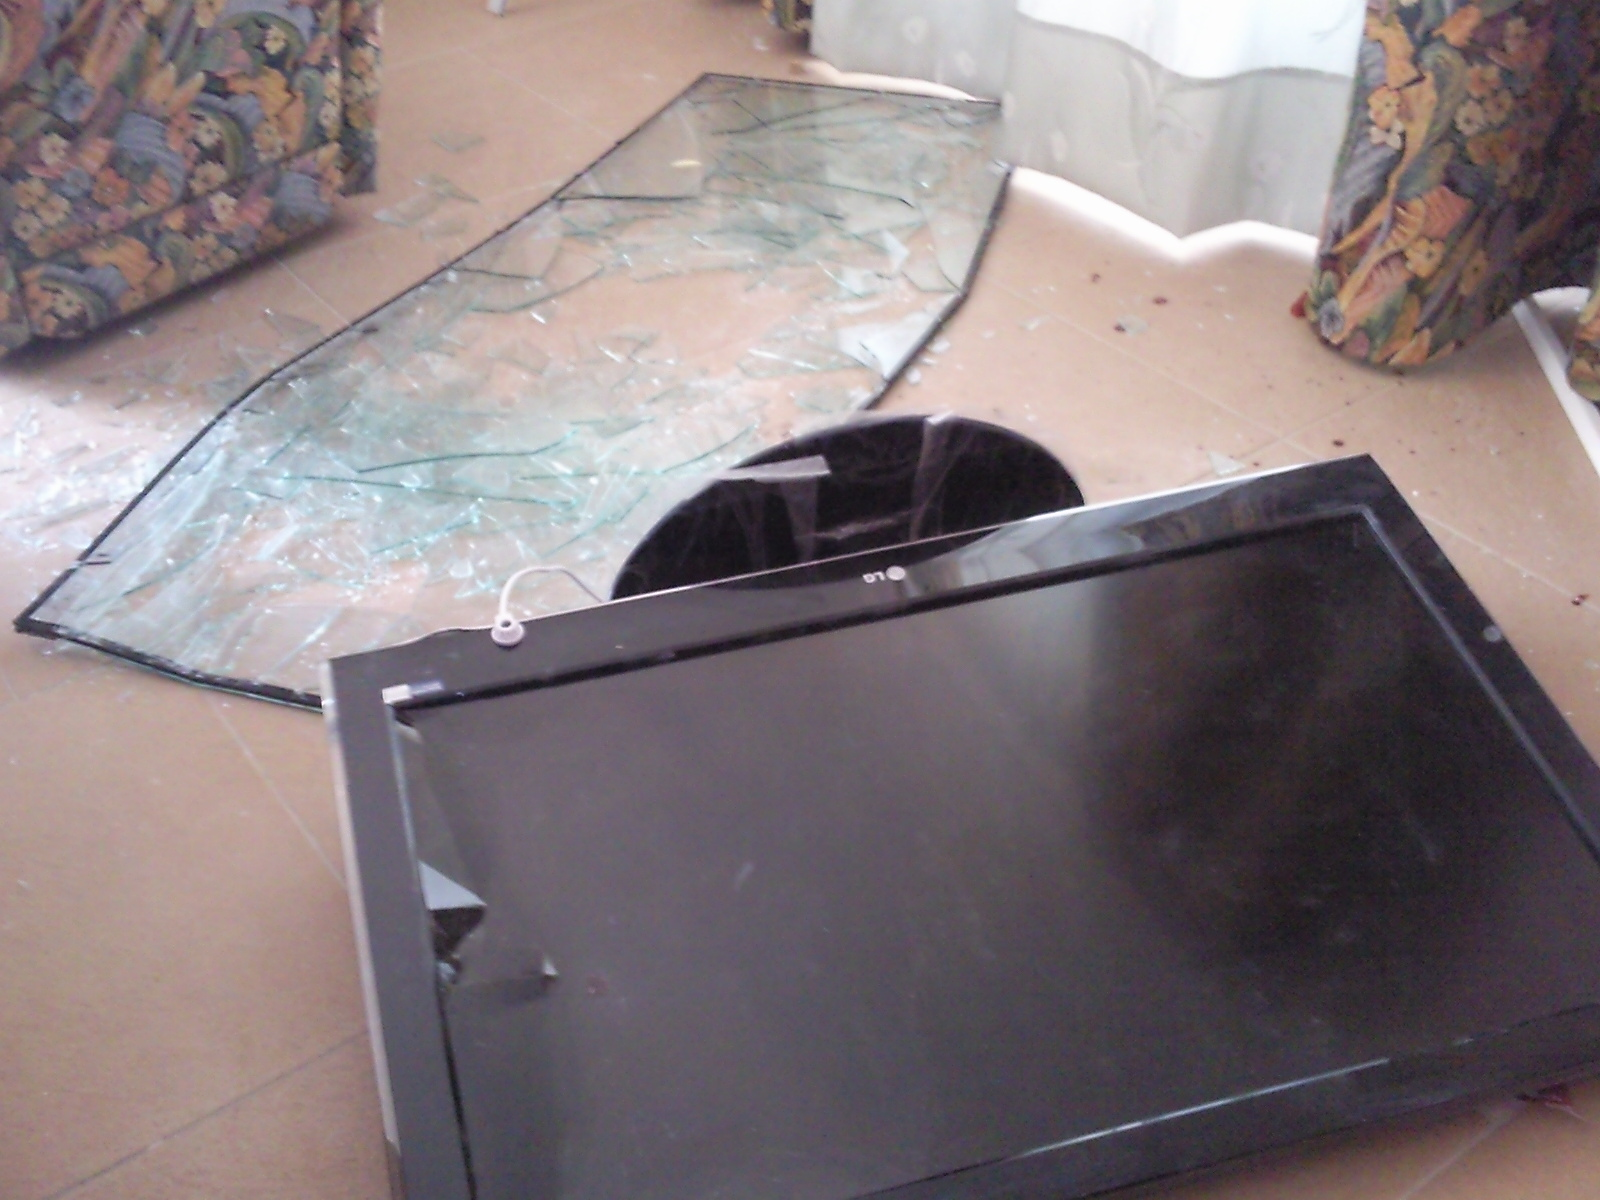 7.cristal-roto-puerta-tv-tirada-suelo